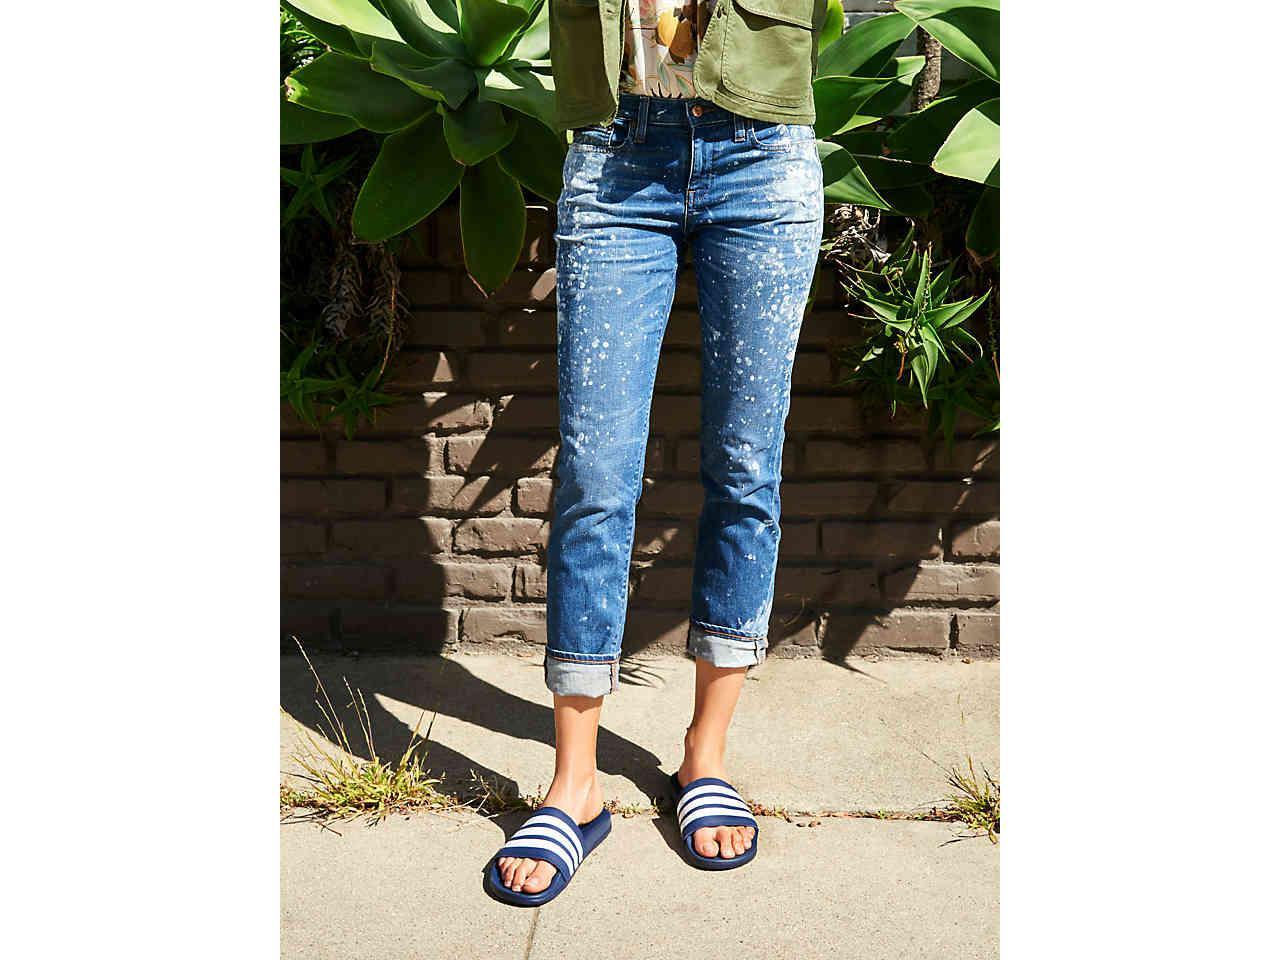 f7f328ce80f27 Adidas - Blue Adilette Cloudfoam Ultra Stripes Slide Sandal - Lyst. View  fullscreen